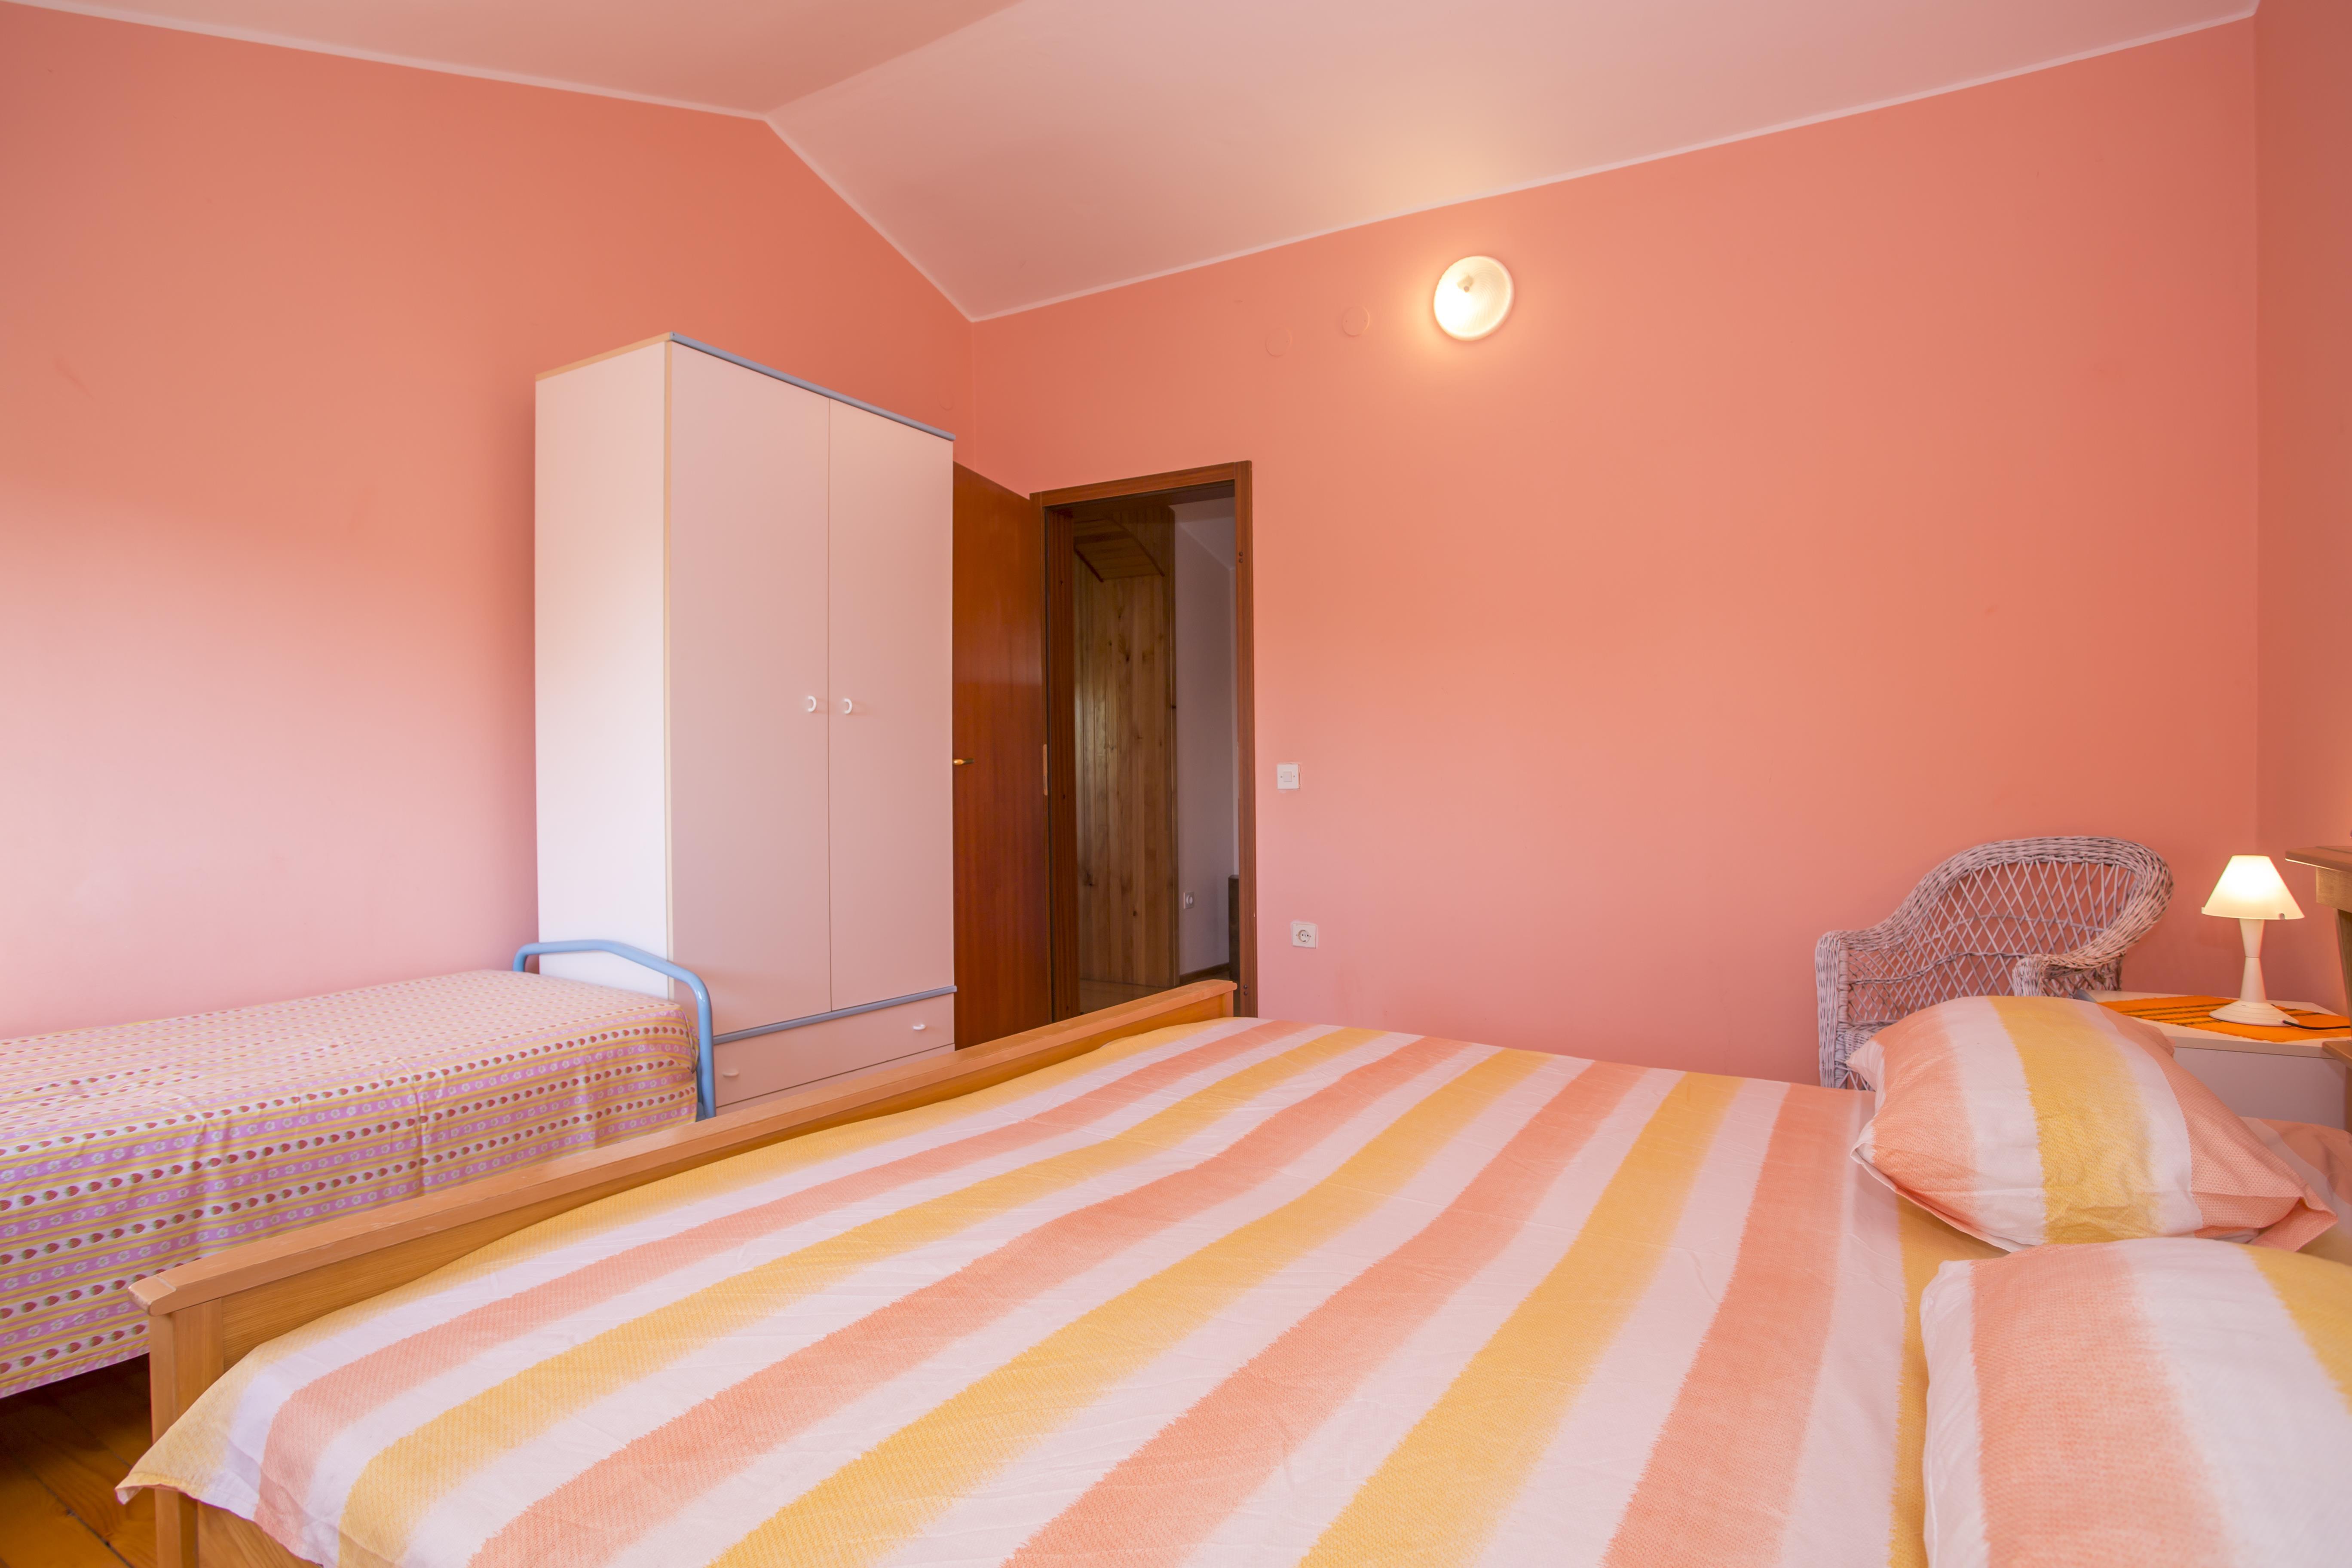 Ferienhaus Istrian Villa Kacana Vodnjan (834347), Vodnjan, , Istrien, Kroatien, Bild 30